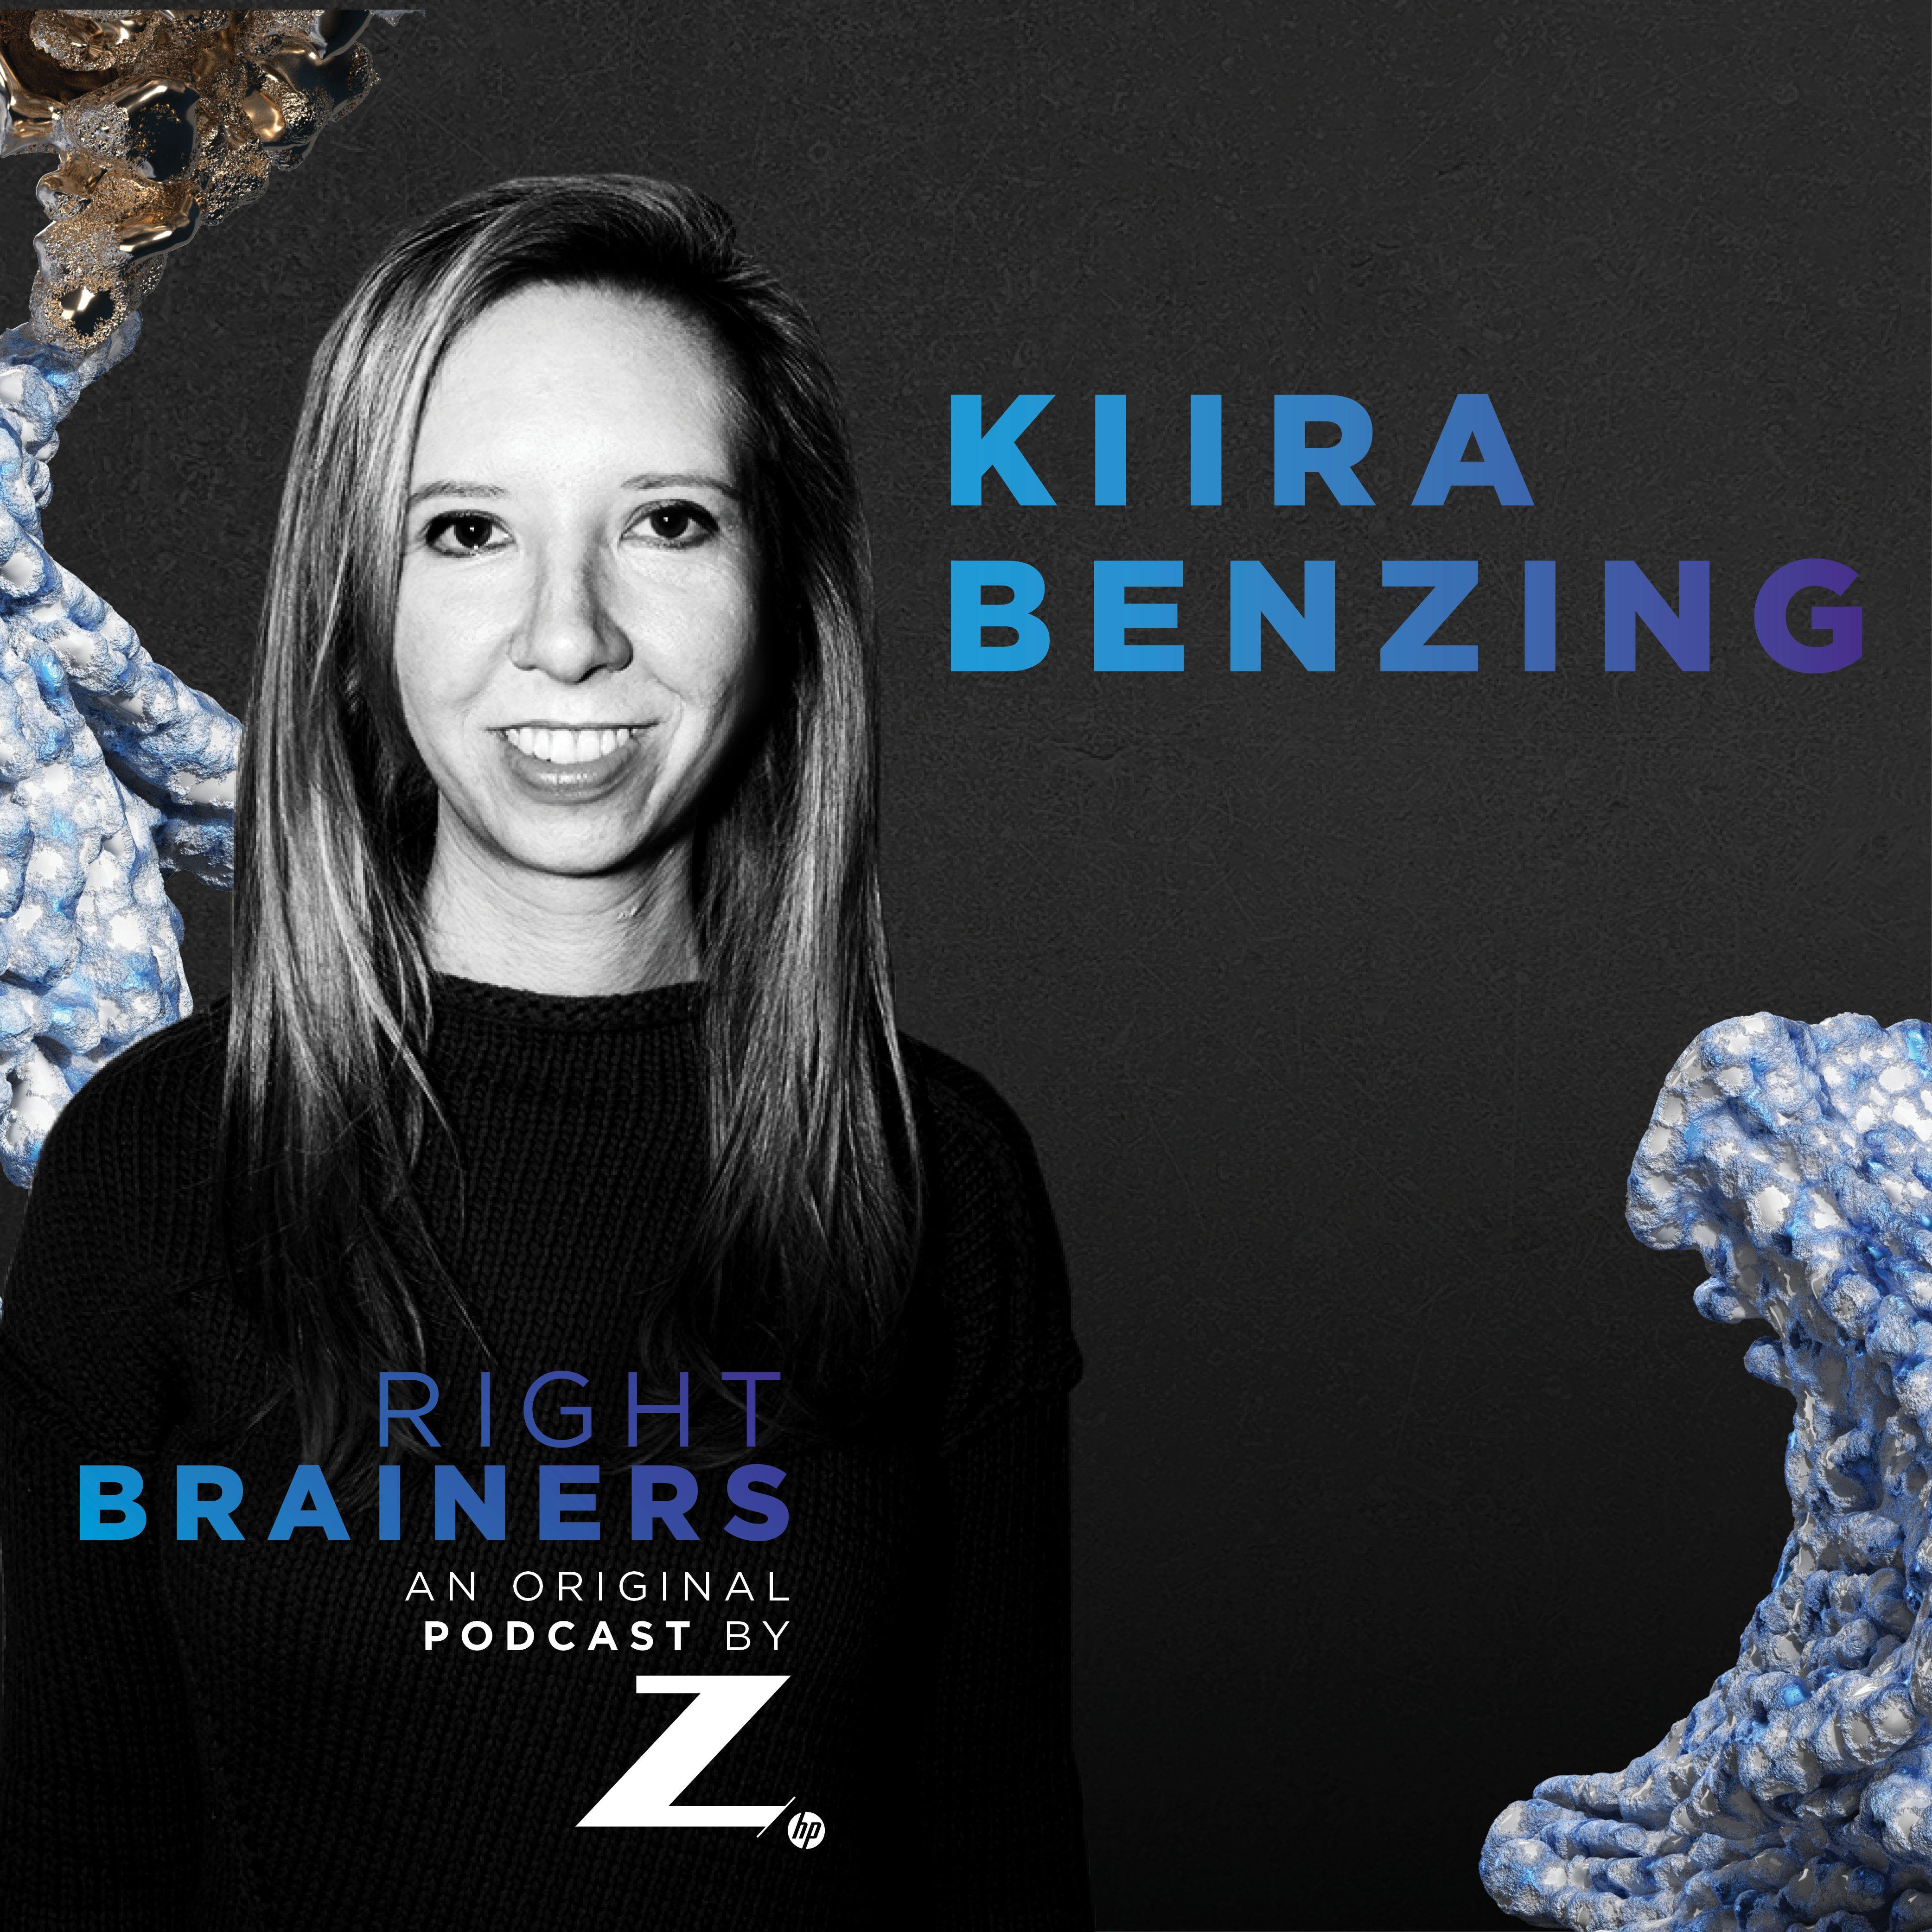 Kiira Benzing: Multidimensional Storytelling